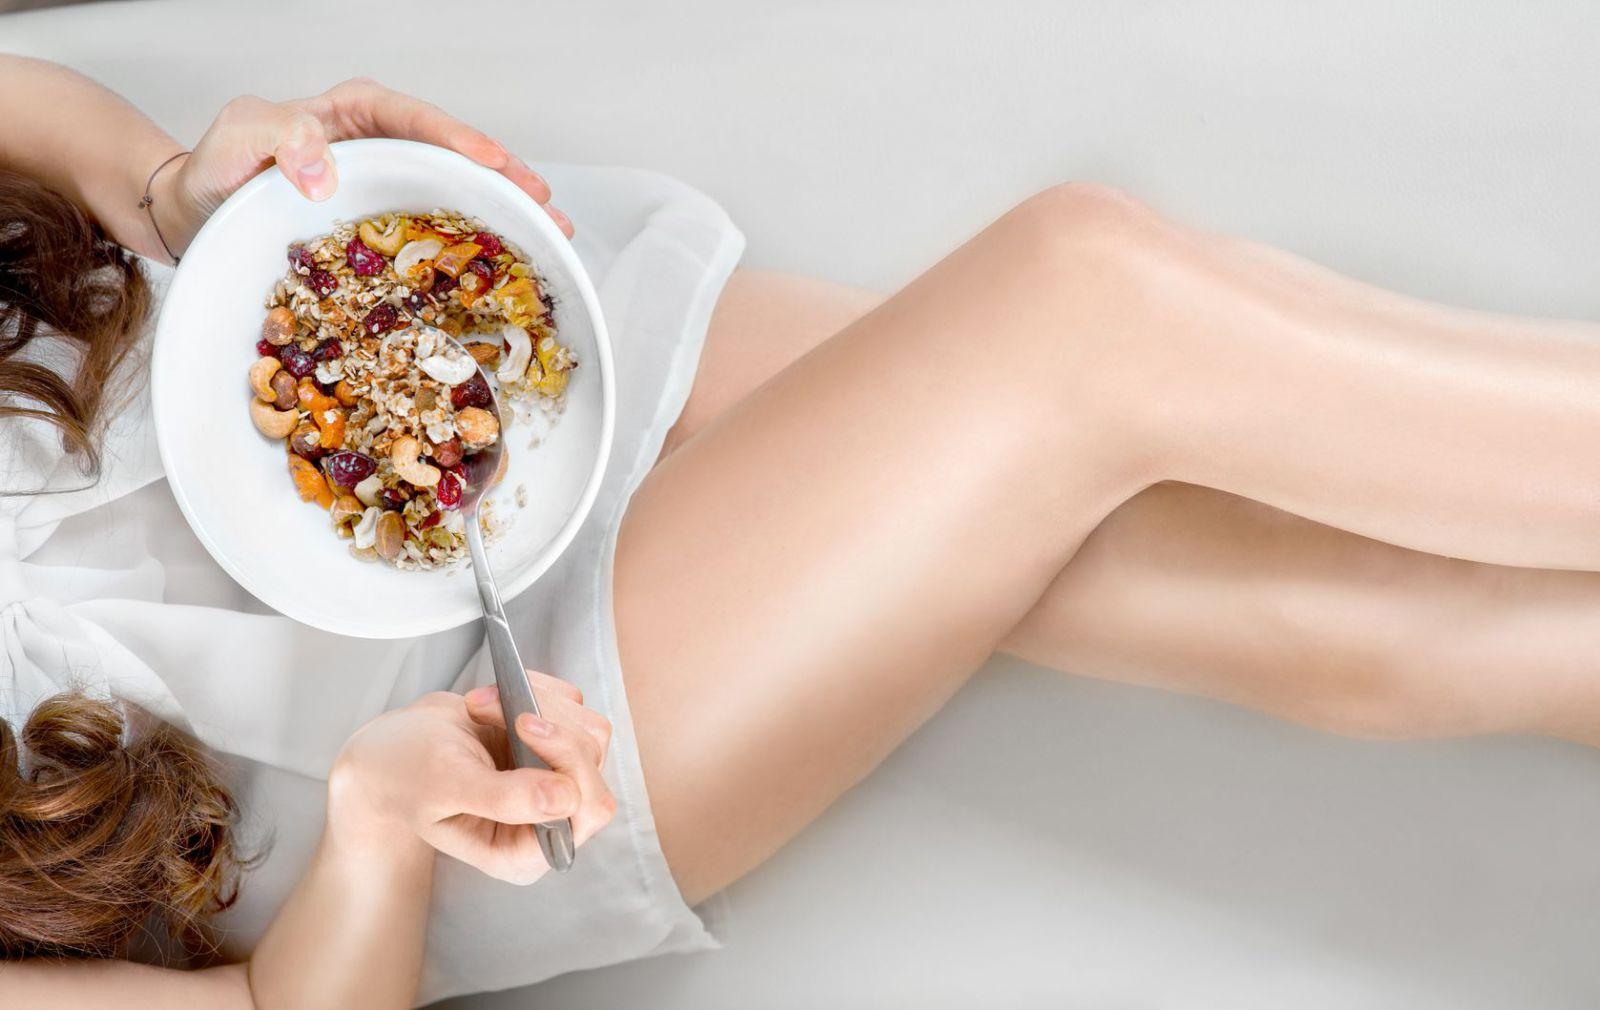 Có nên nhịn ăn tối để giảm cân?